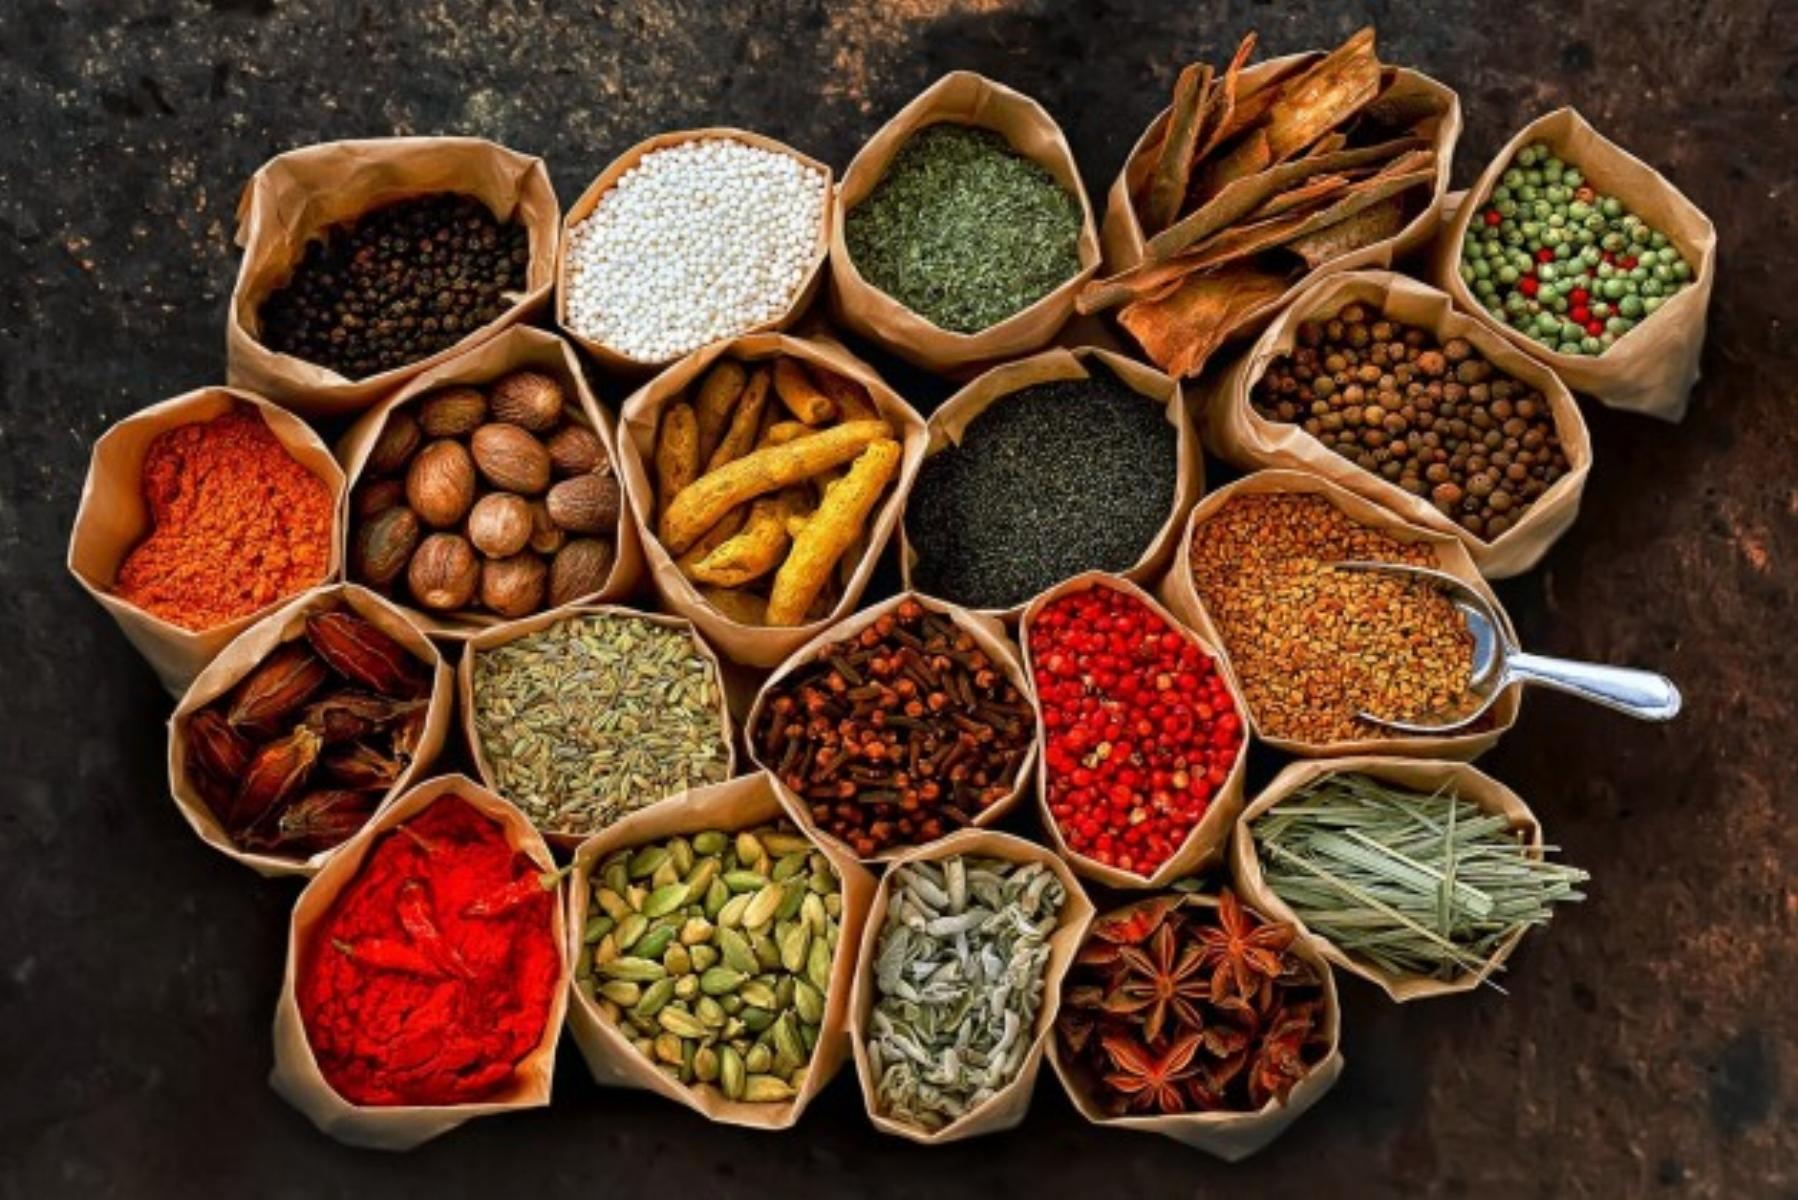 herbs-spices-628x419.jpg